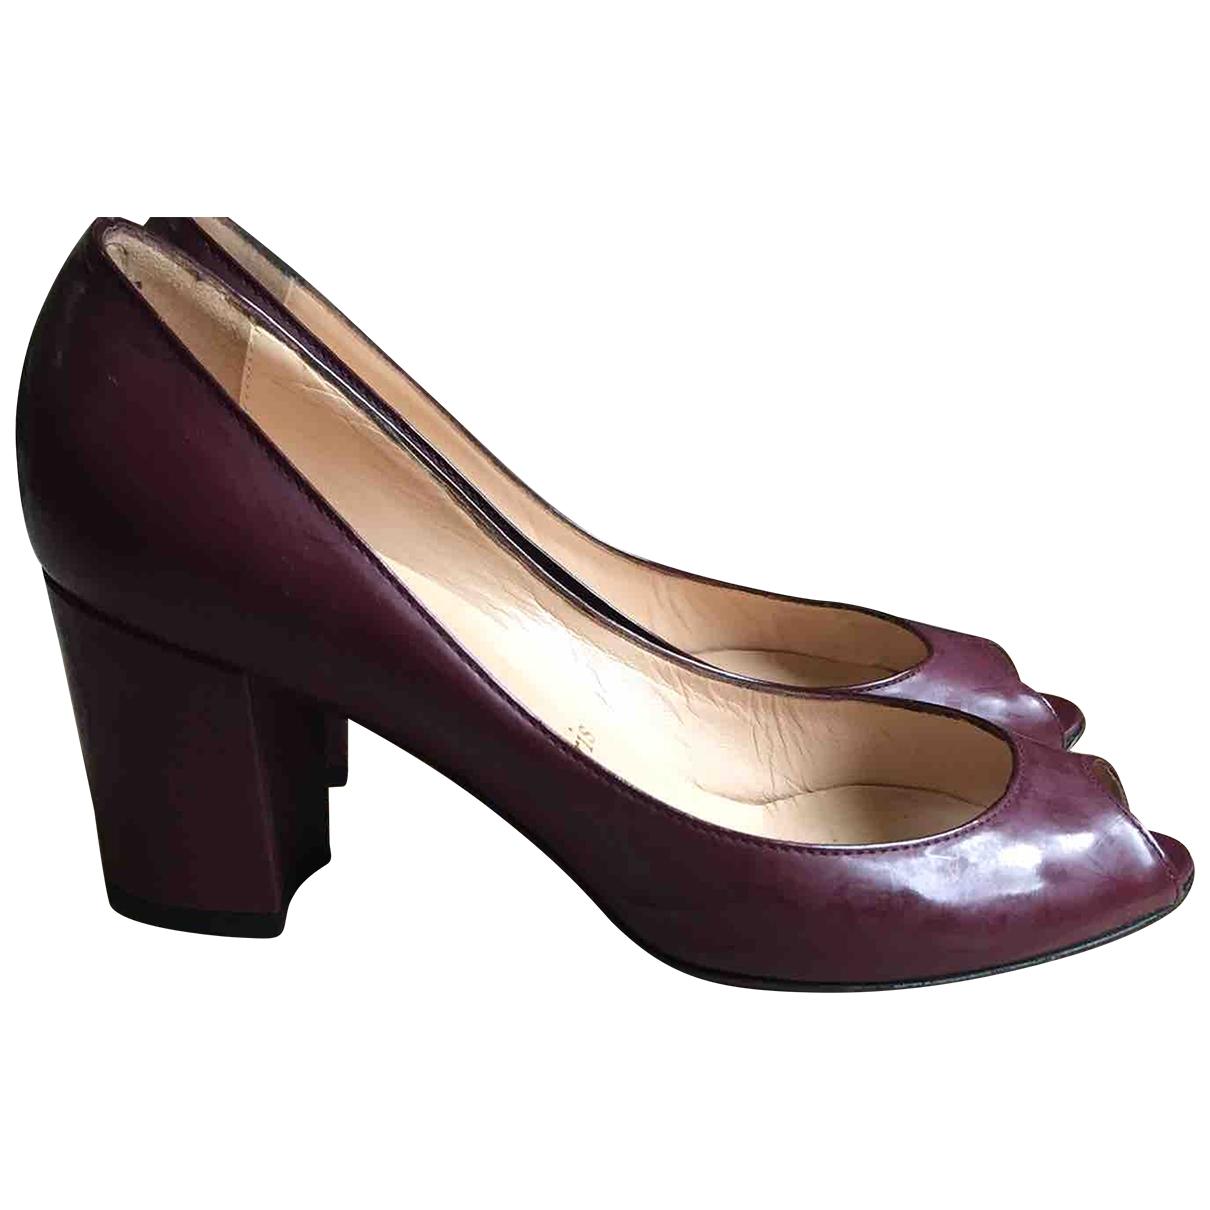 Christian Louboutin \N Burgundy Patent leather Heels for Women 36.5 EU